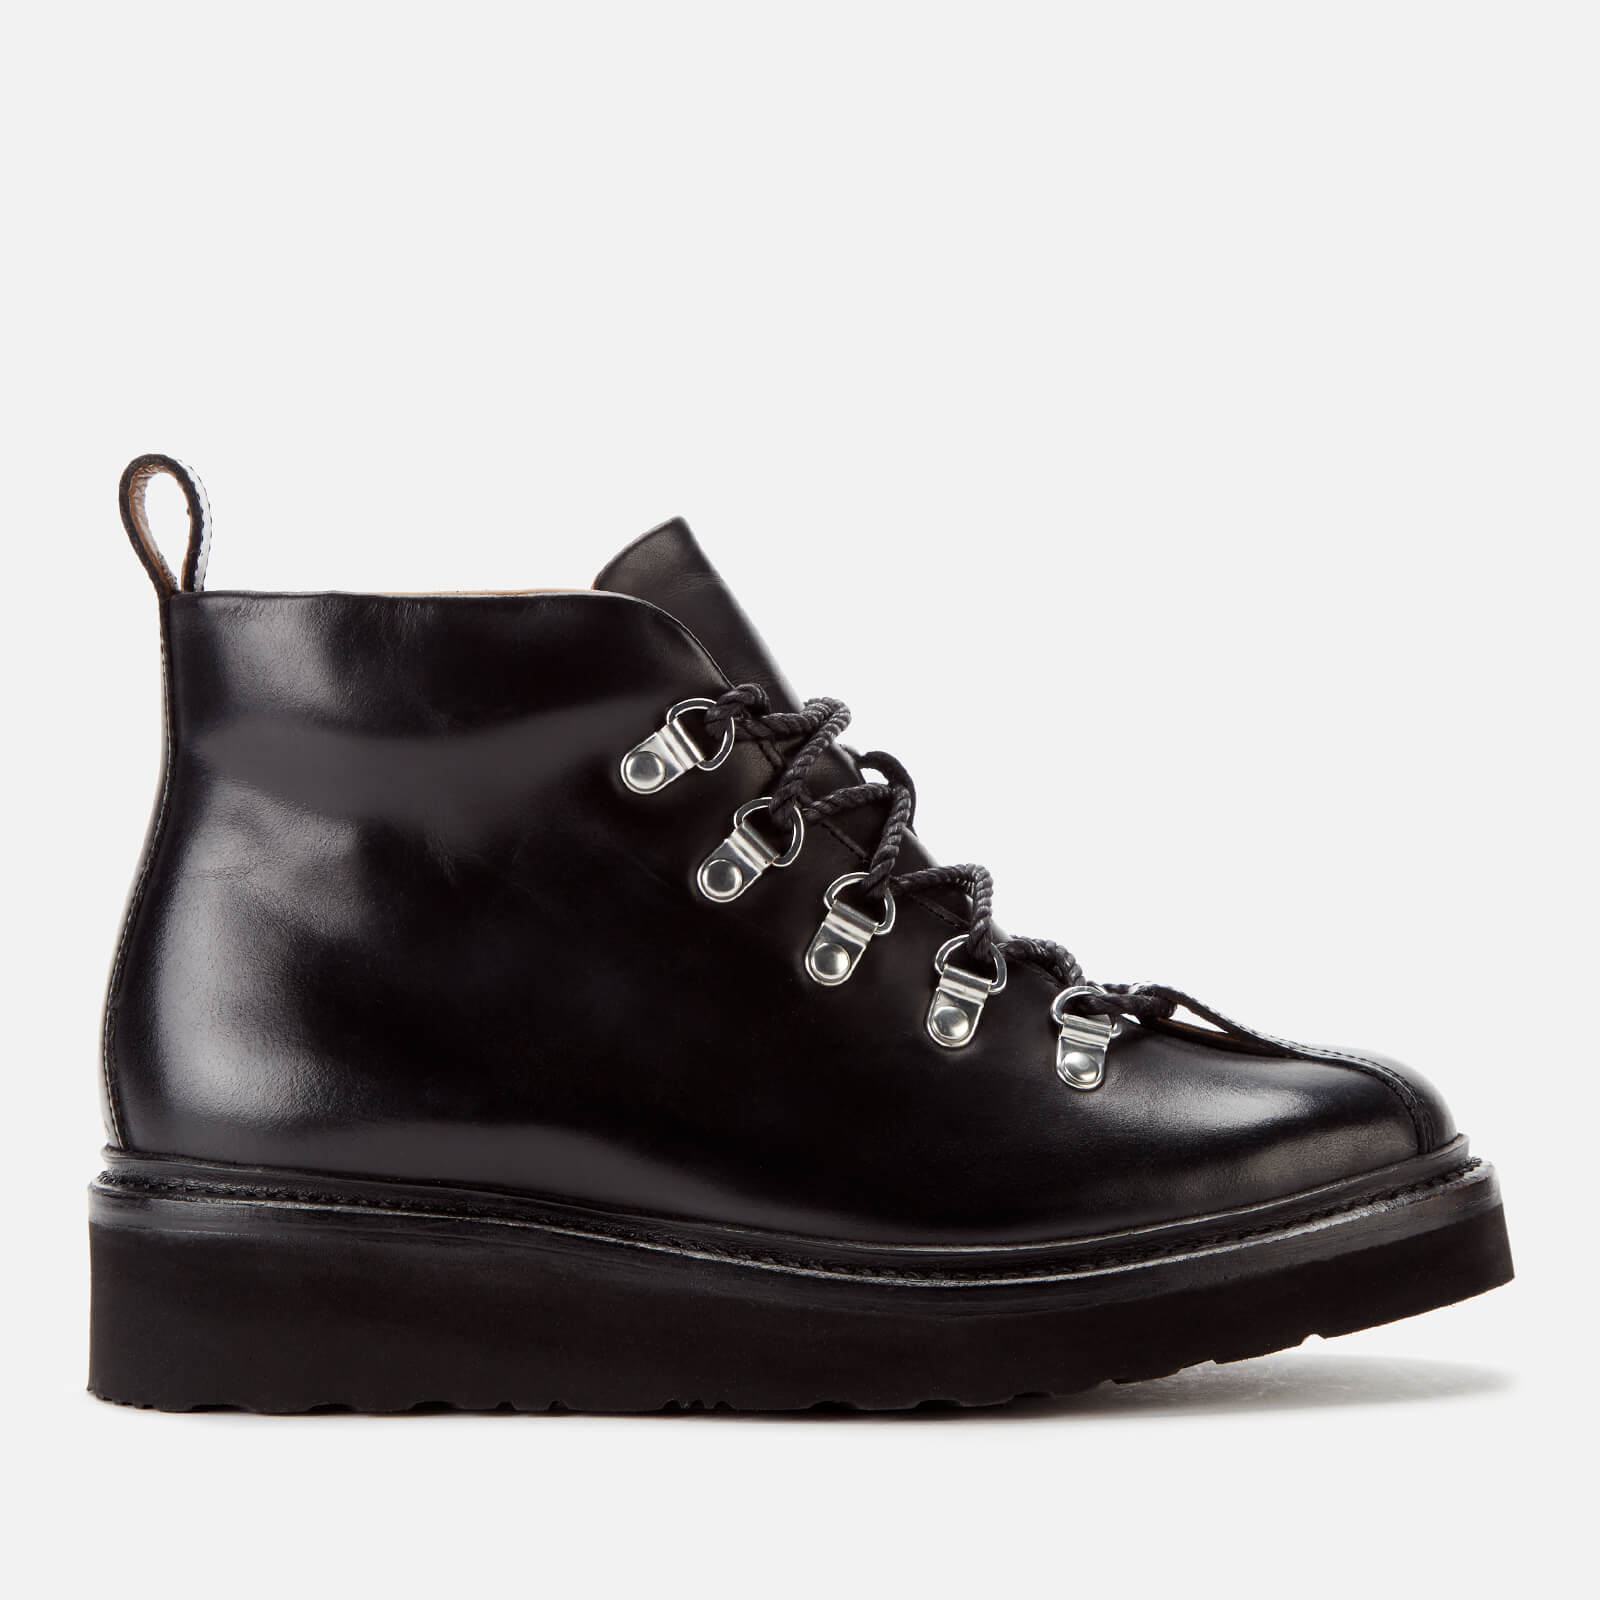 Grenson Women's Bridget Leather Hiking Style Boots - Black - Uk 3 - Black